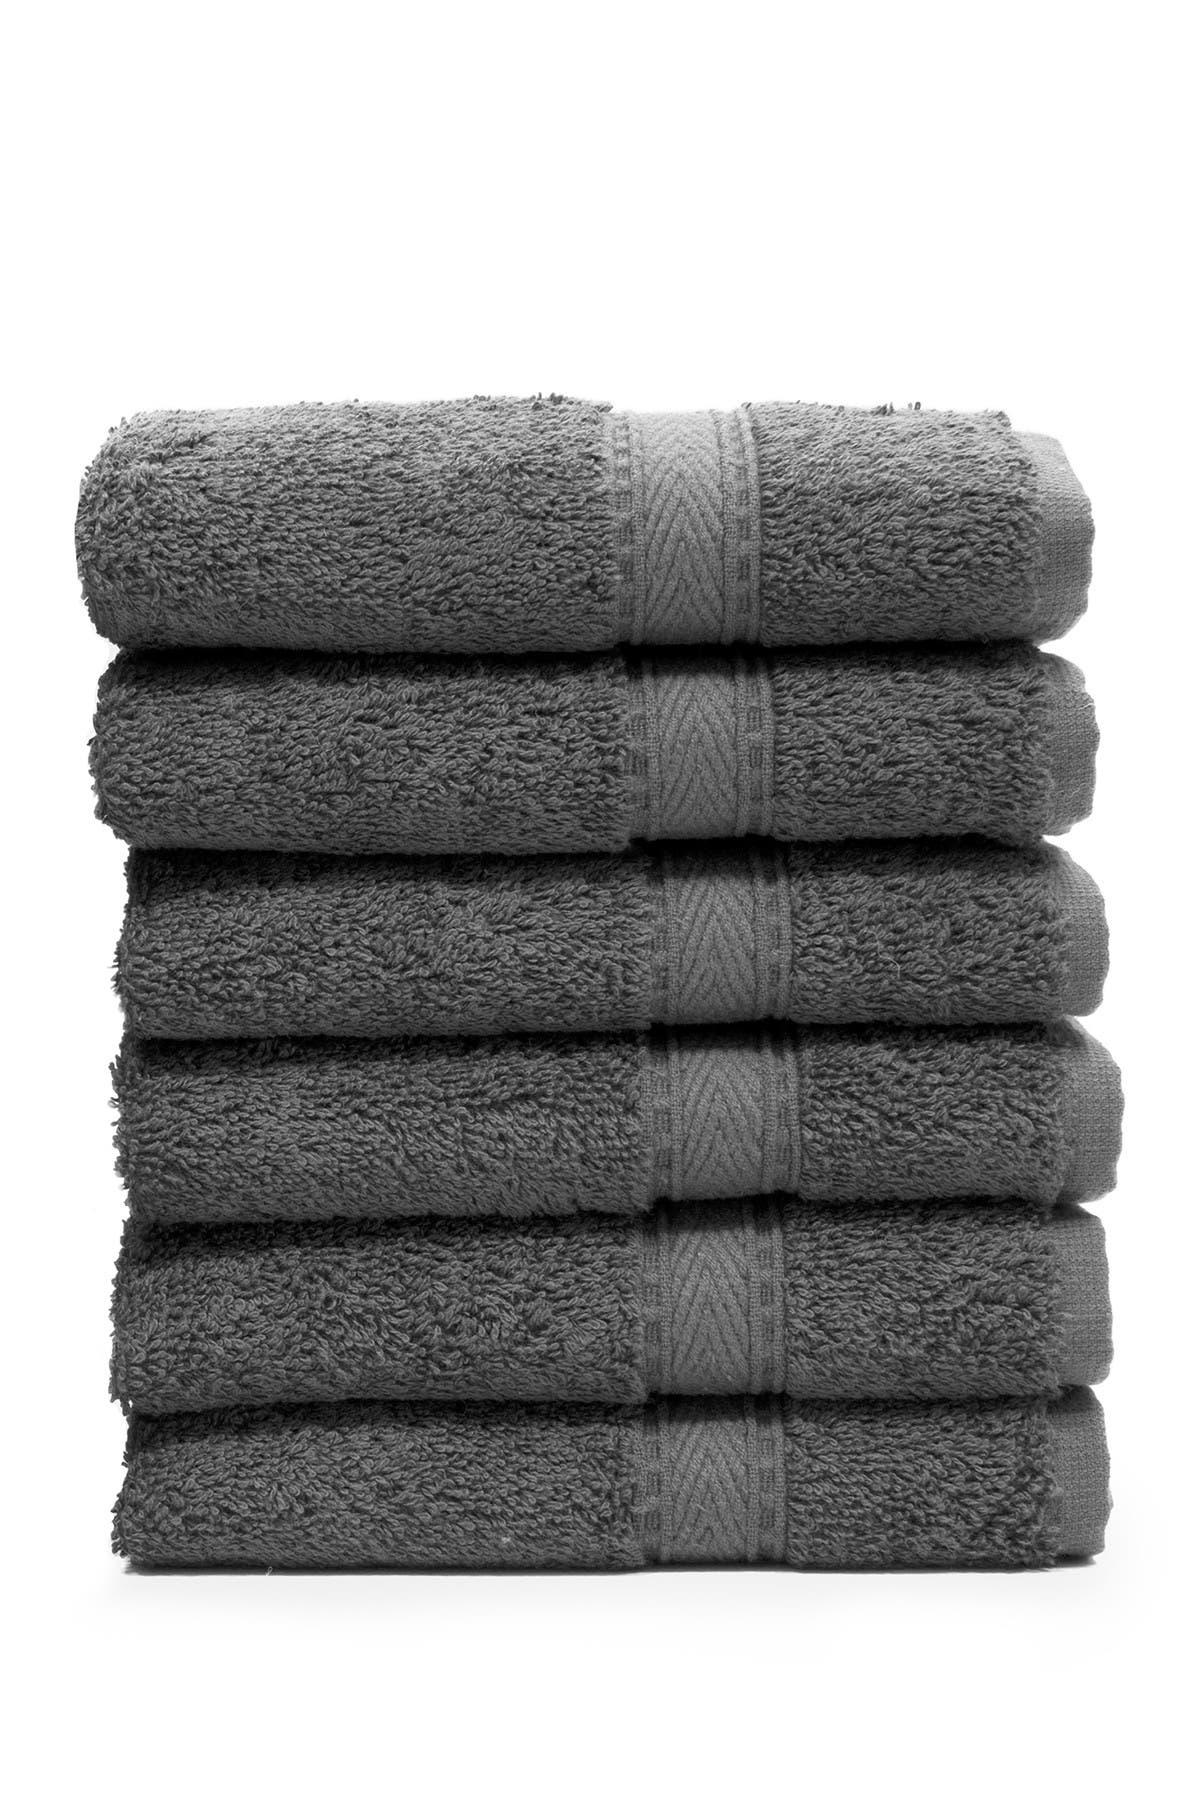 Image of LINUM HOME Sinemis Terry Washcloths - Set of 6 - Dark Grey